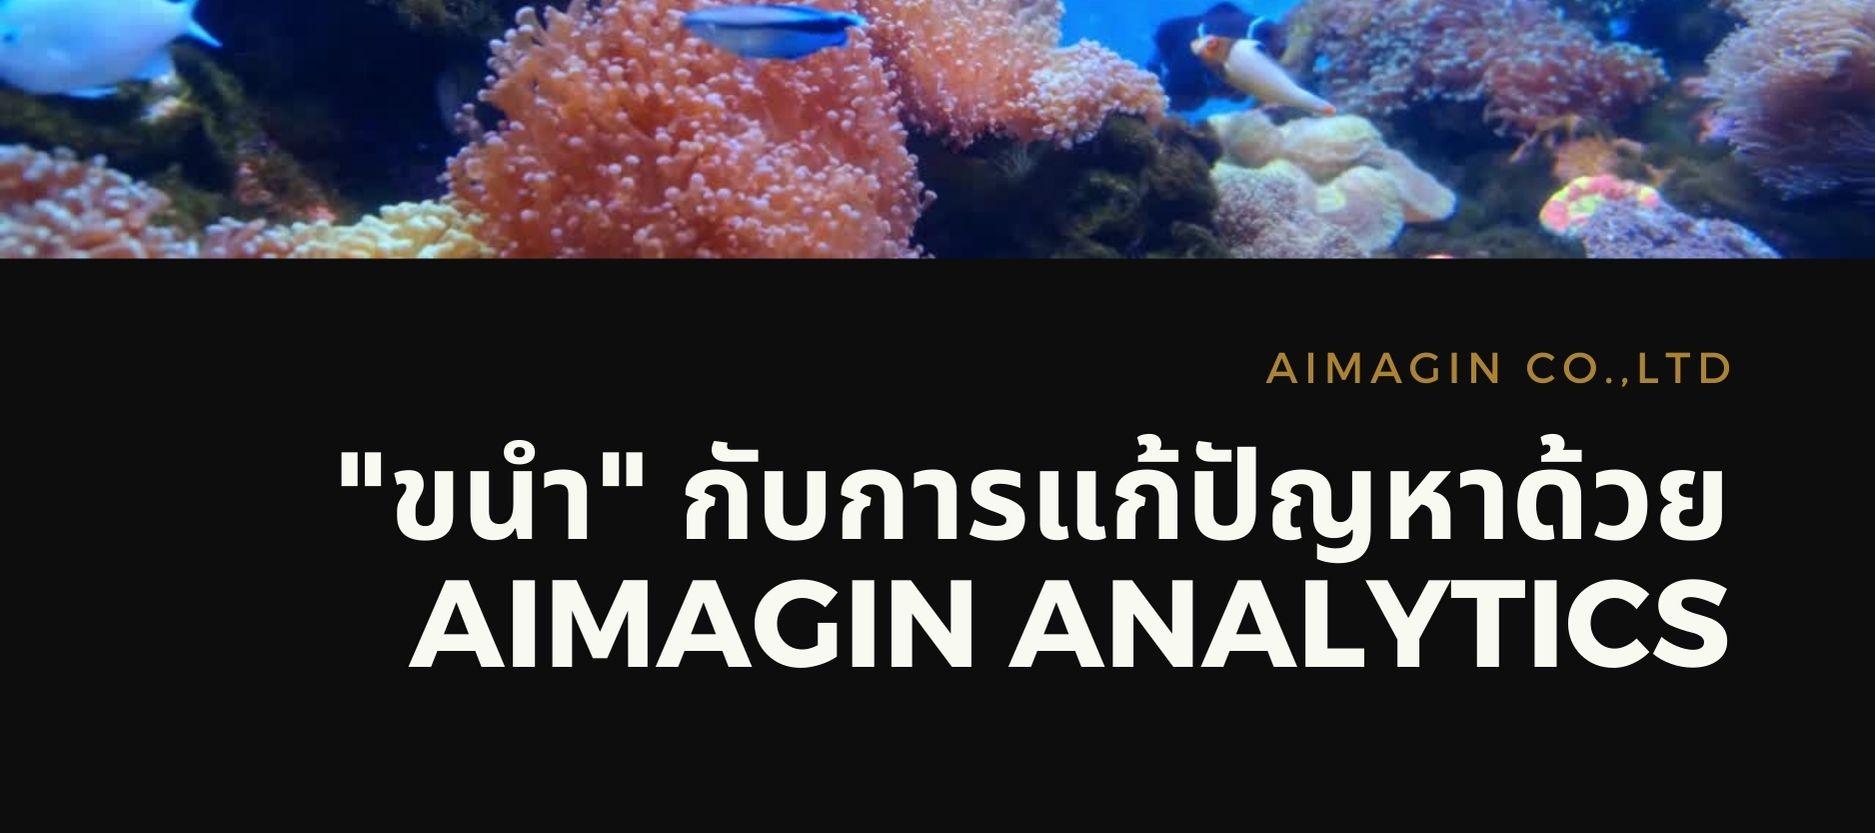 Aimagin Analytics for Shellfish Culture